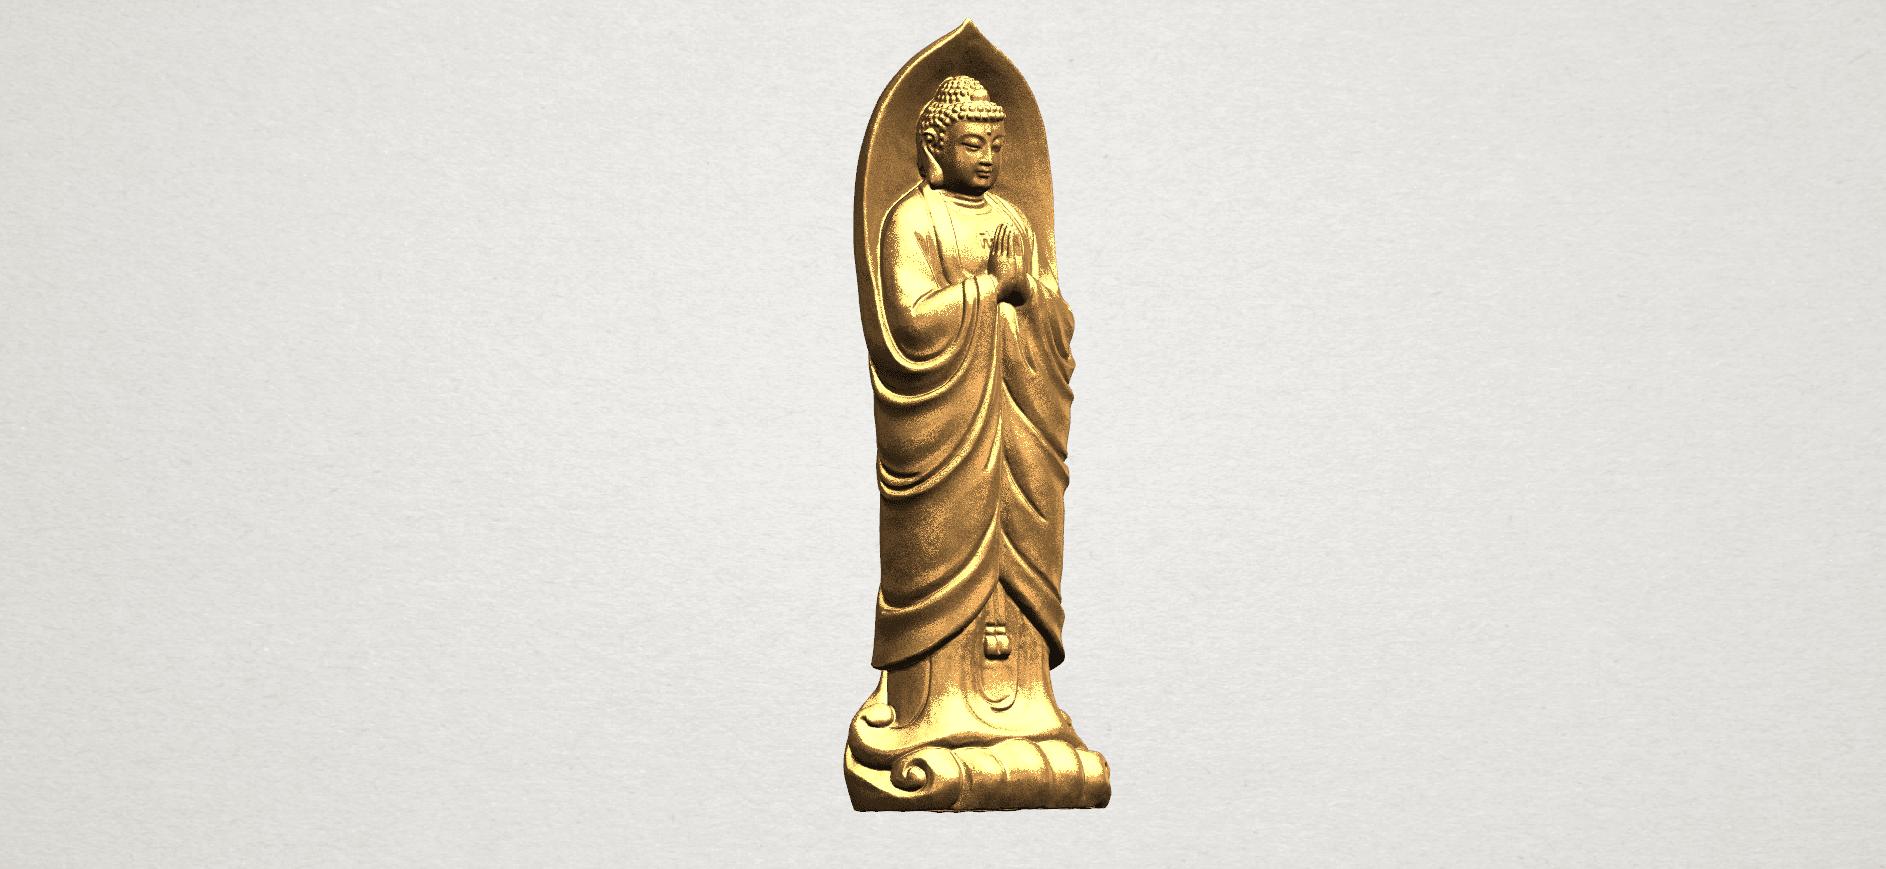 Gautama Buddha Standing (iv) A07.png Download free STL file Gautama Buddha Standing 04 • 3D printable design, GeorgesNikkei